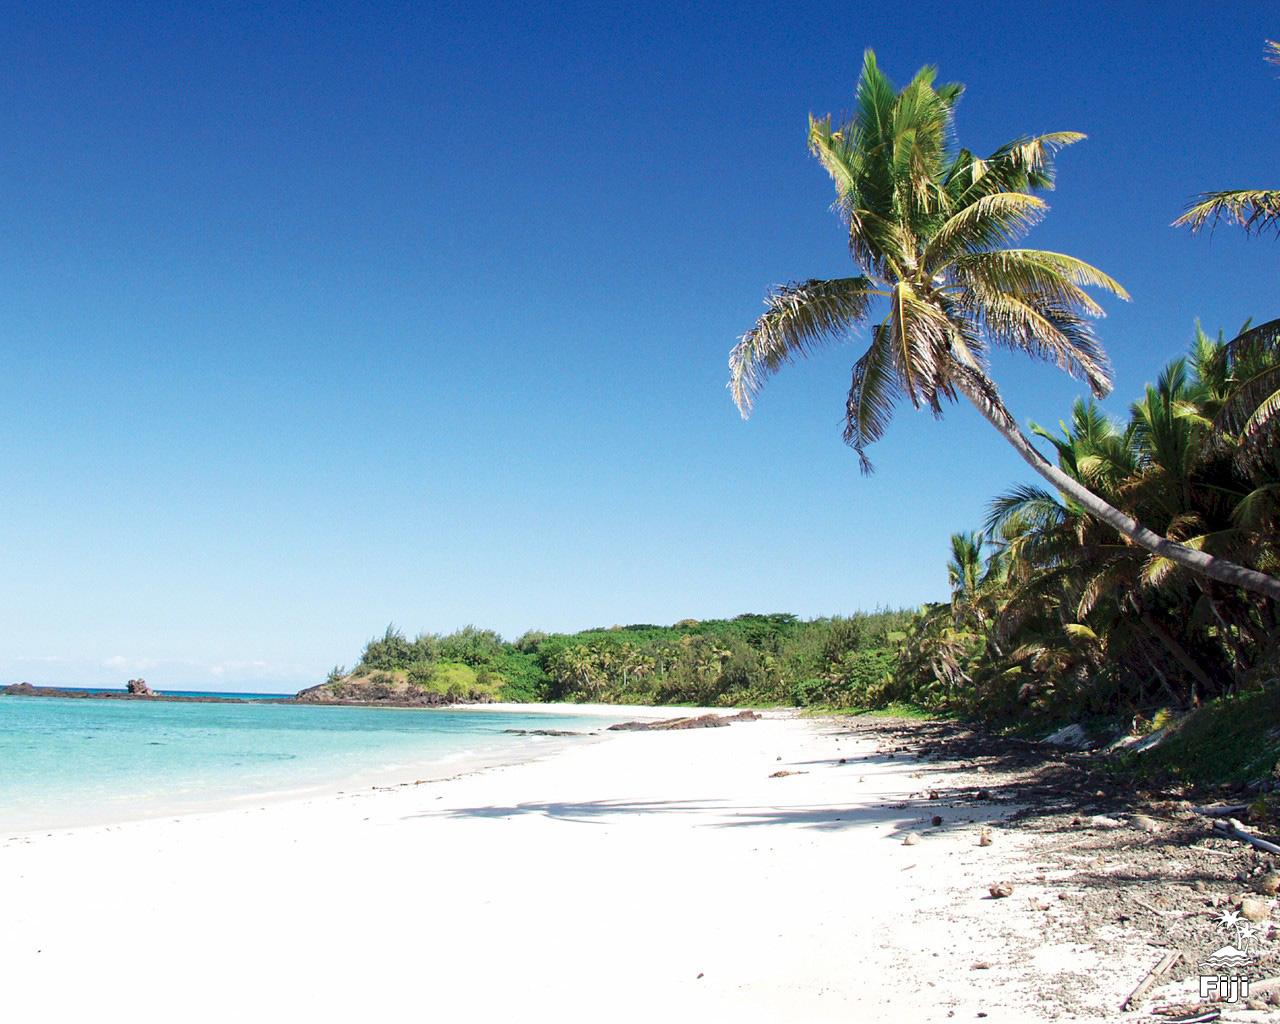 Fiji Picture